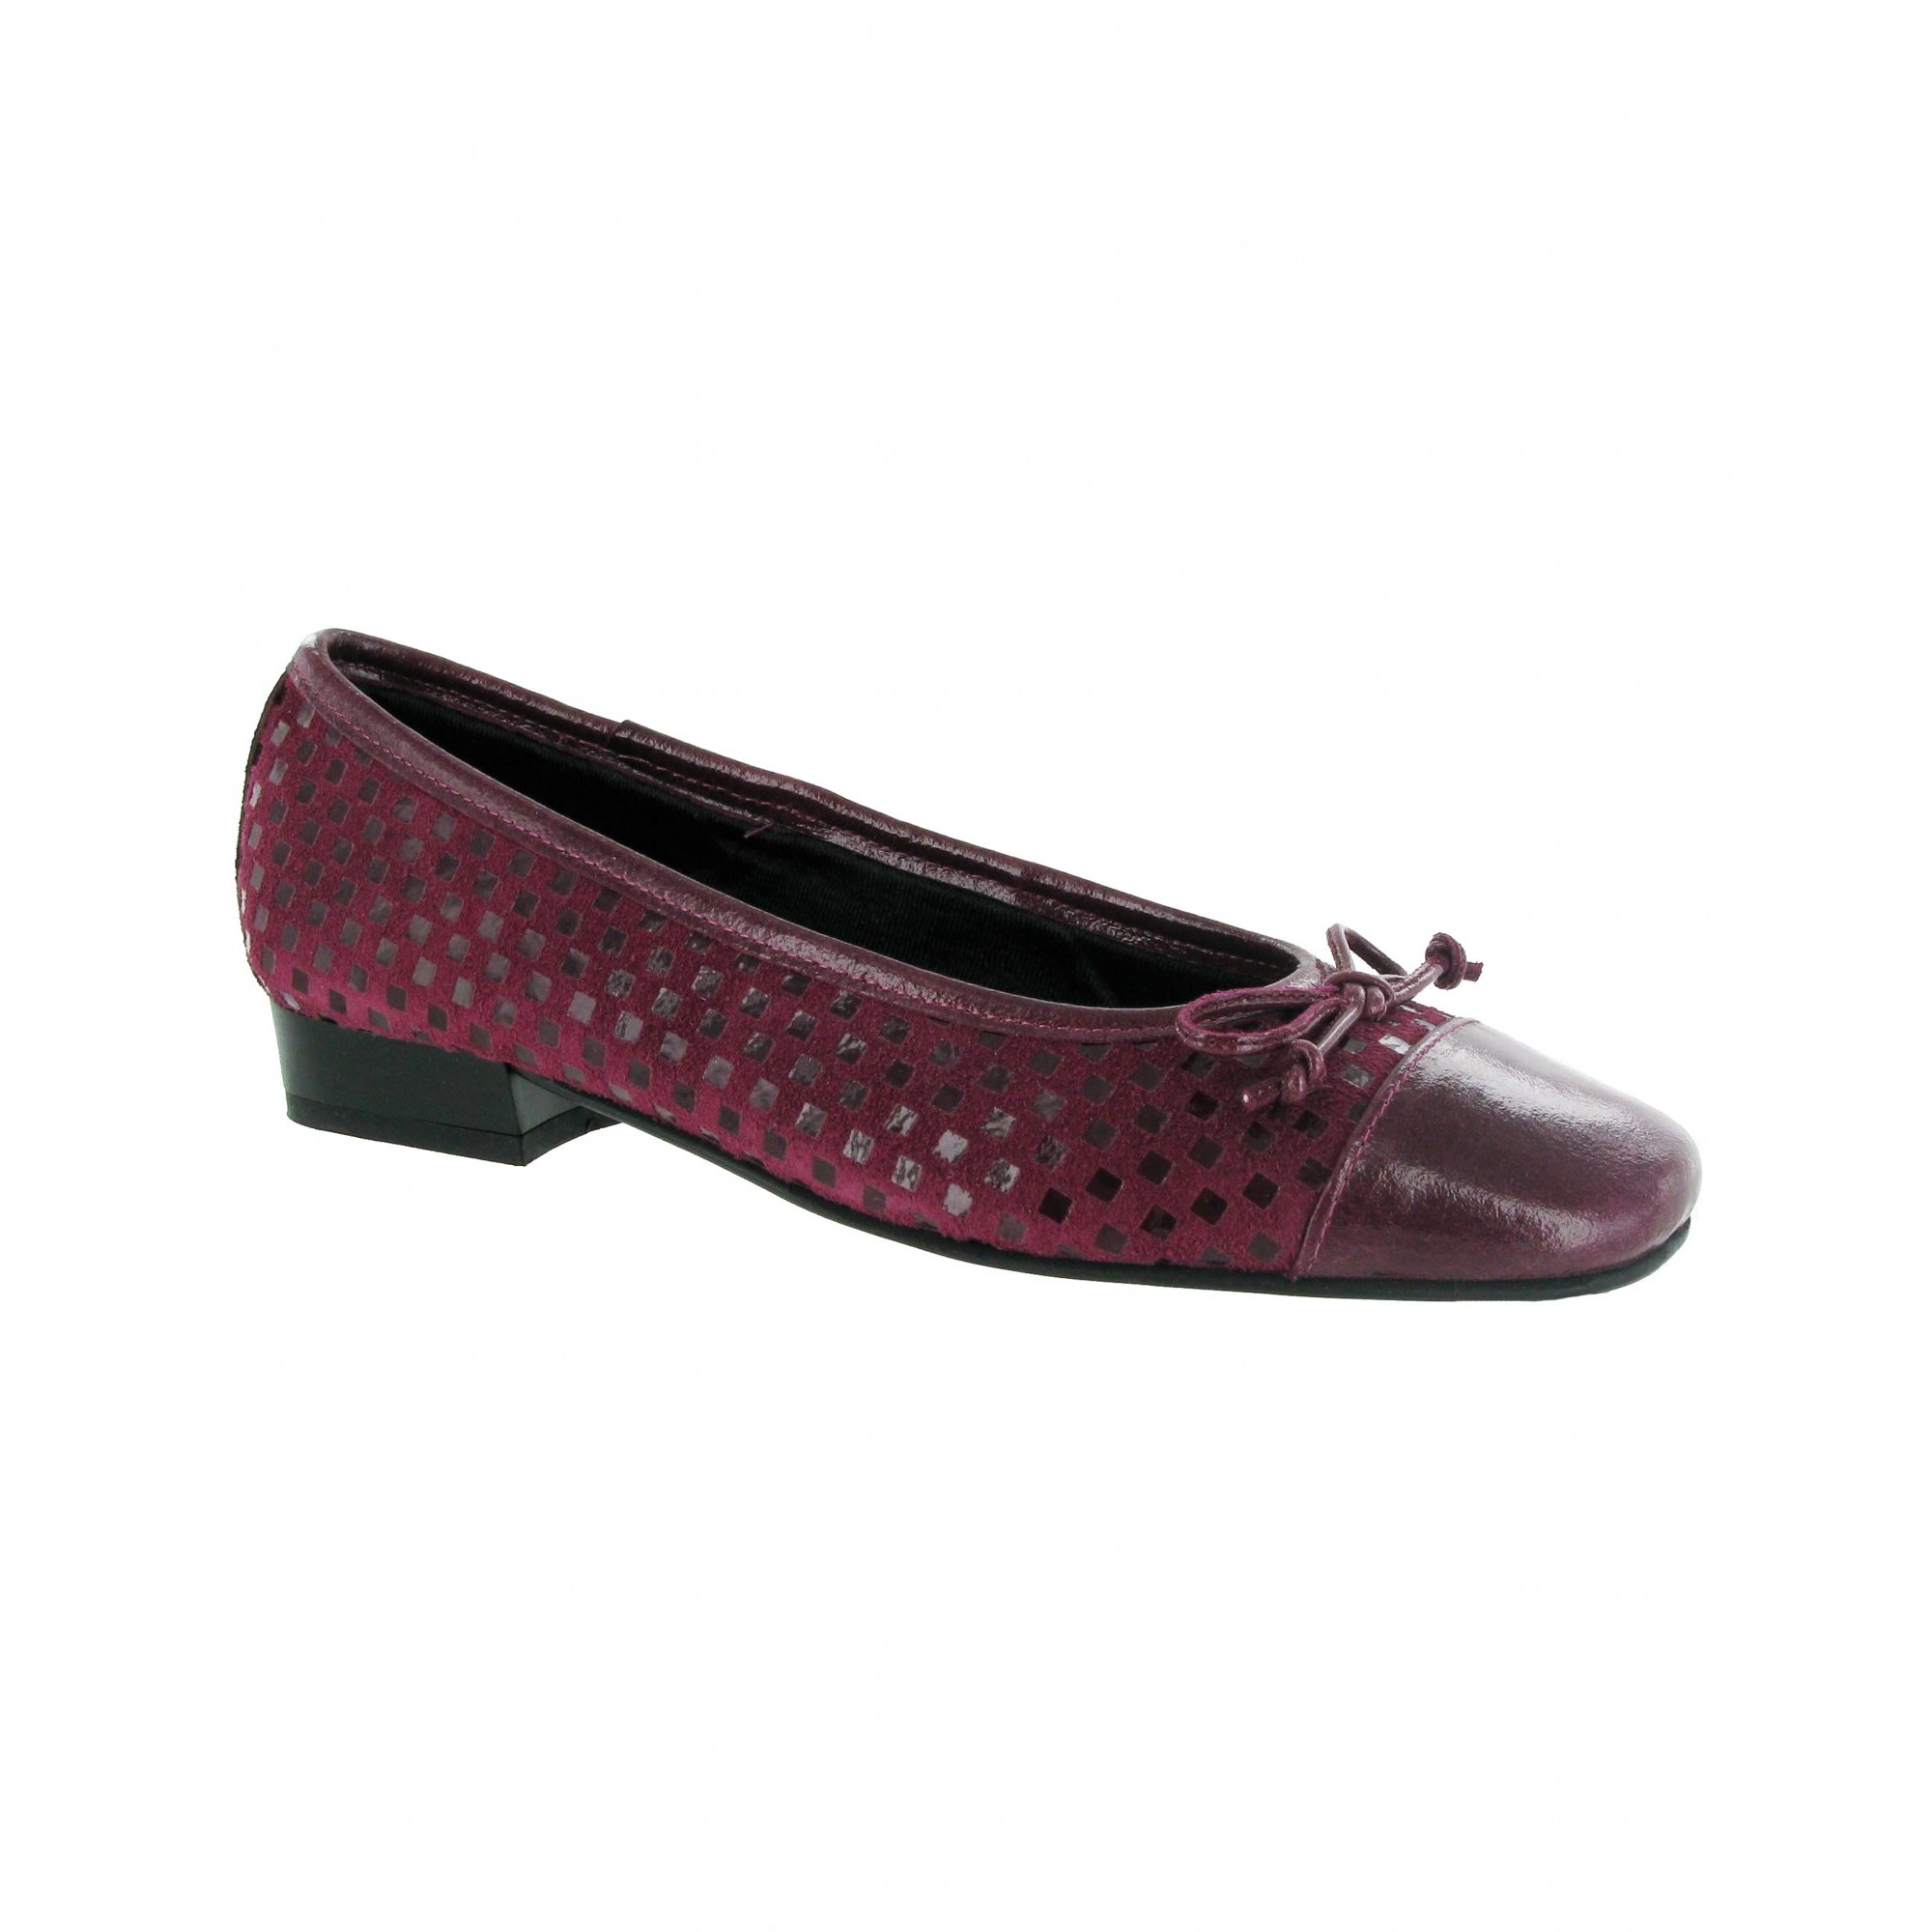 Riva Andros Patent/Suede Women's Ballerina Shoe Fuchsia - 38 vPJCZTC